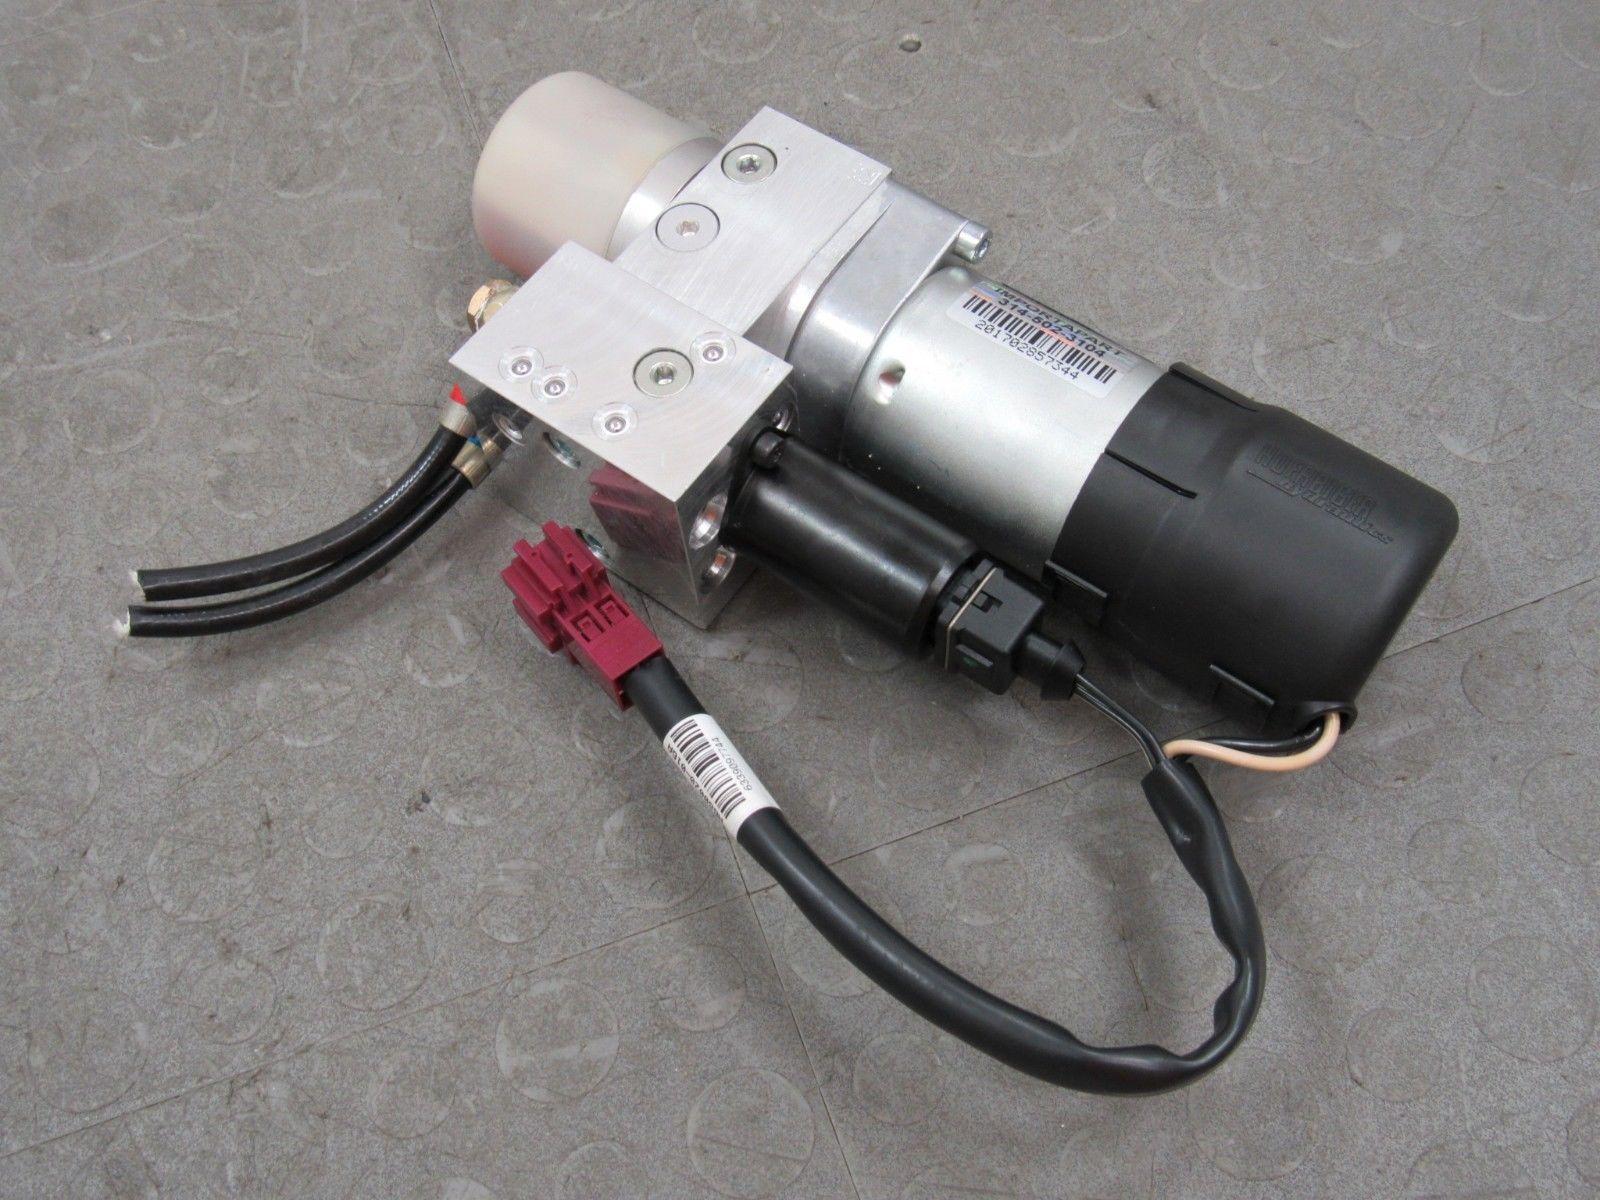 06-09 Mercedes R Class Power Hatch Liftgate Tailgate Open Close Actuator  Pump C